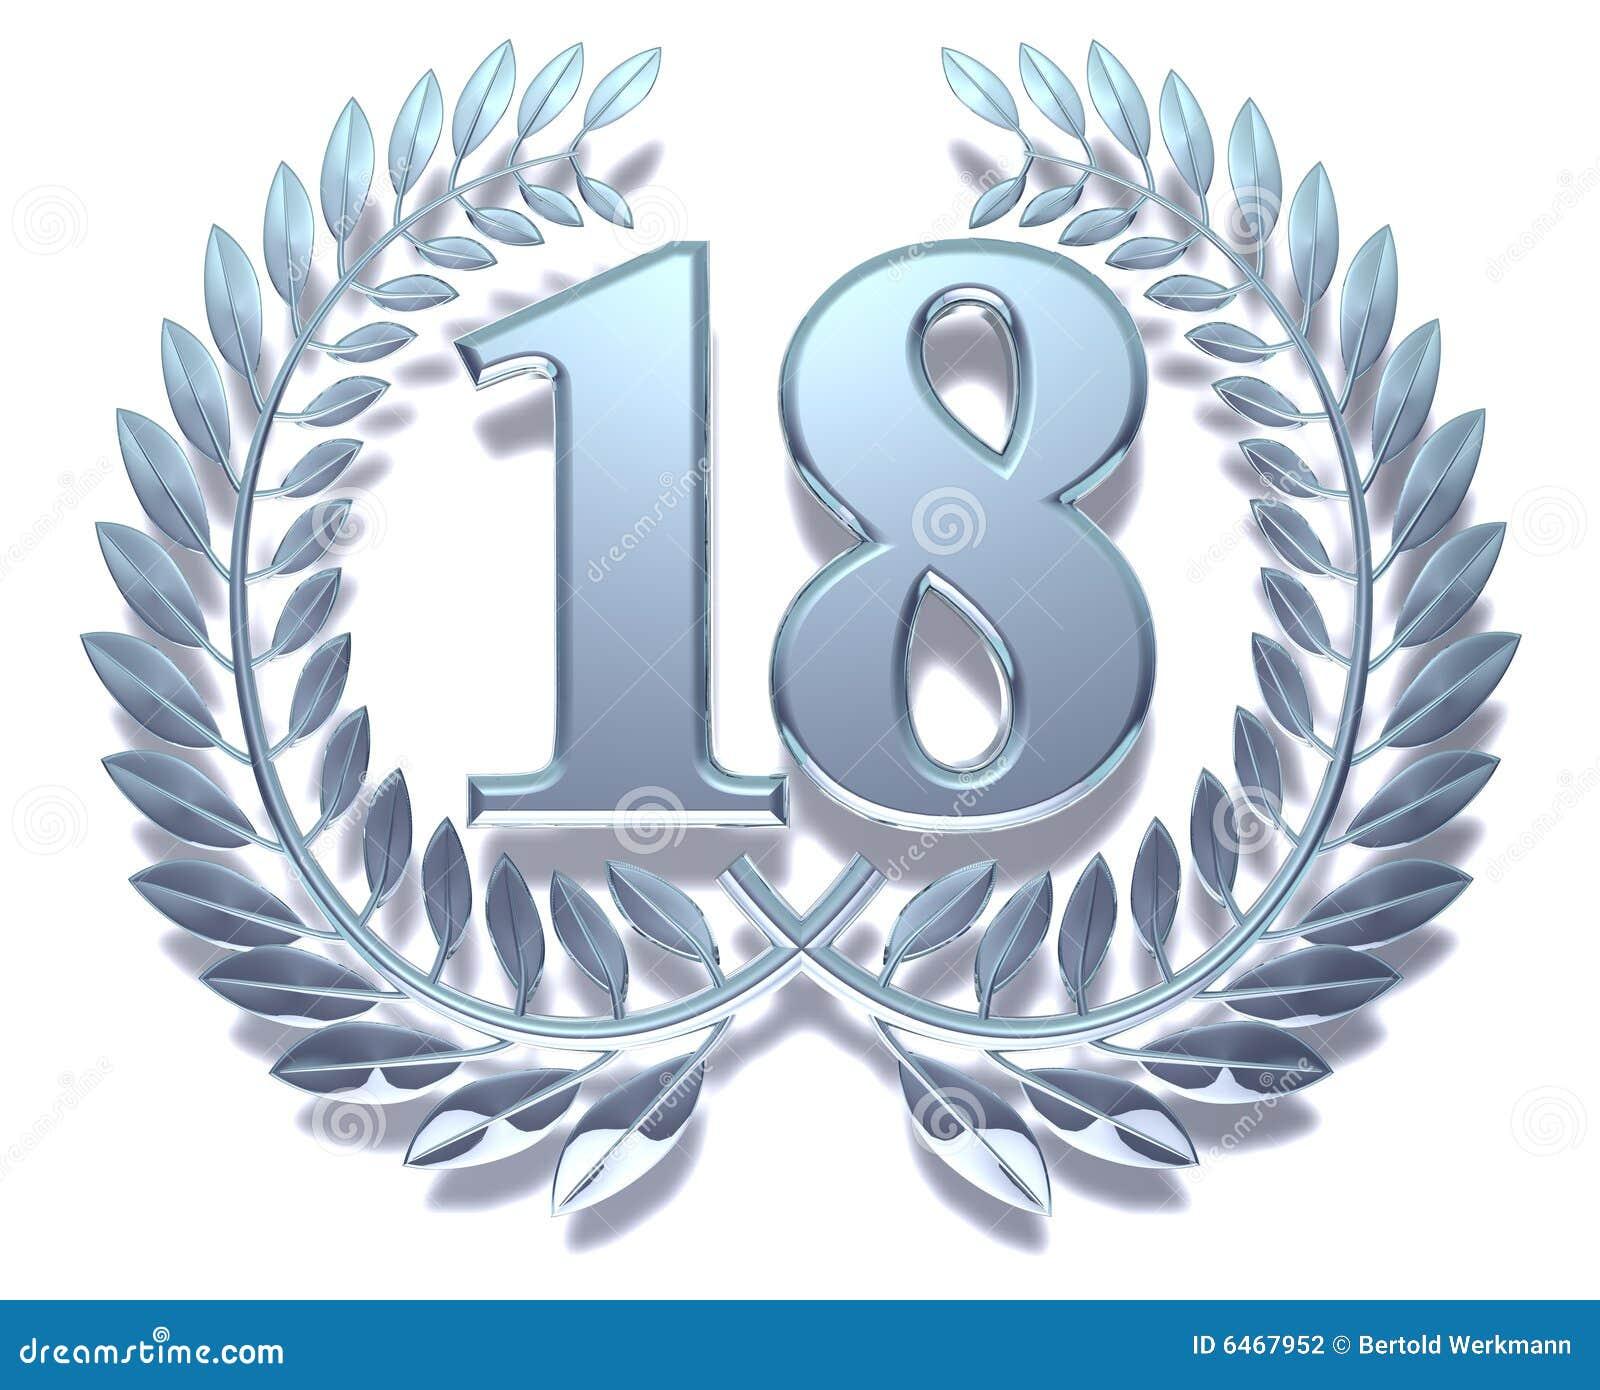 18 bobków wianek